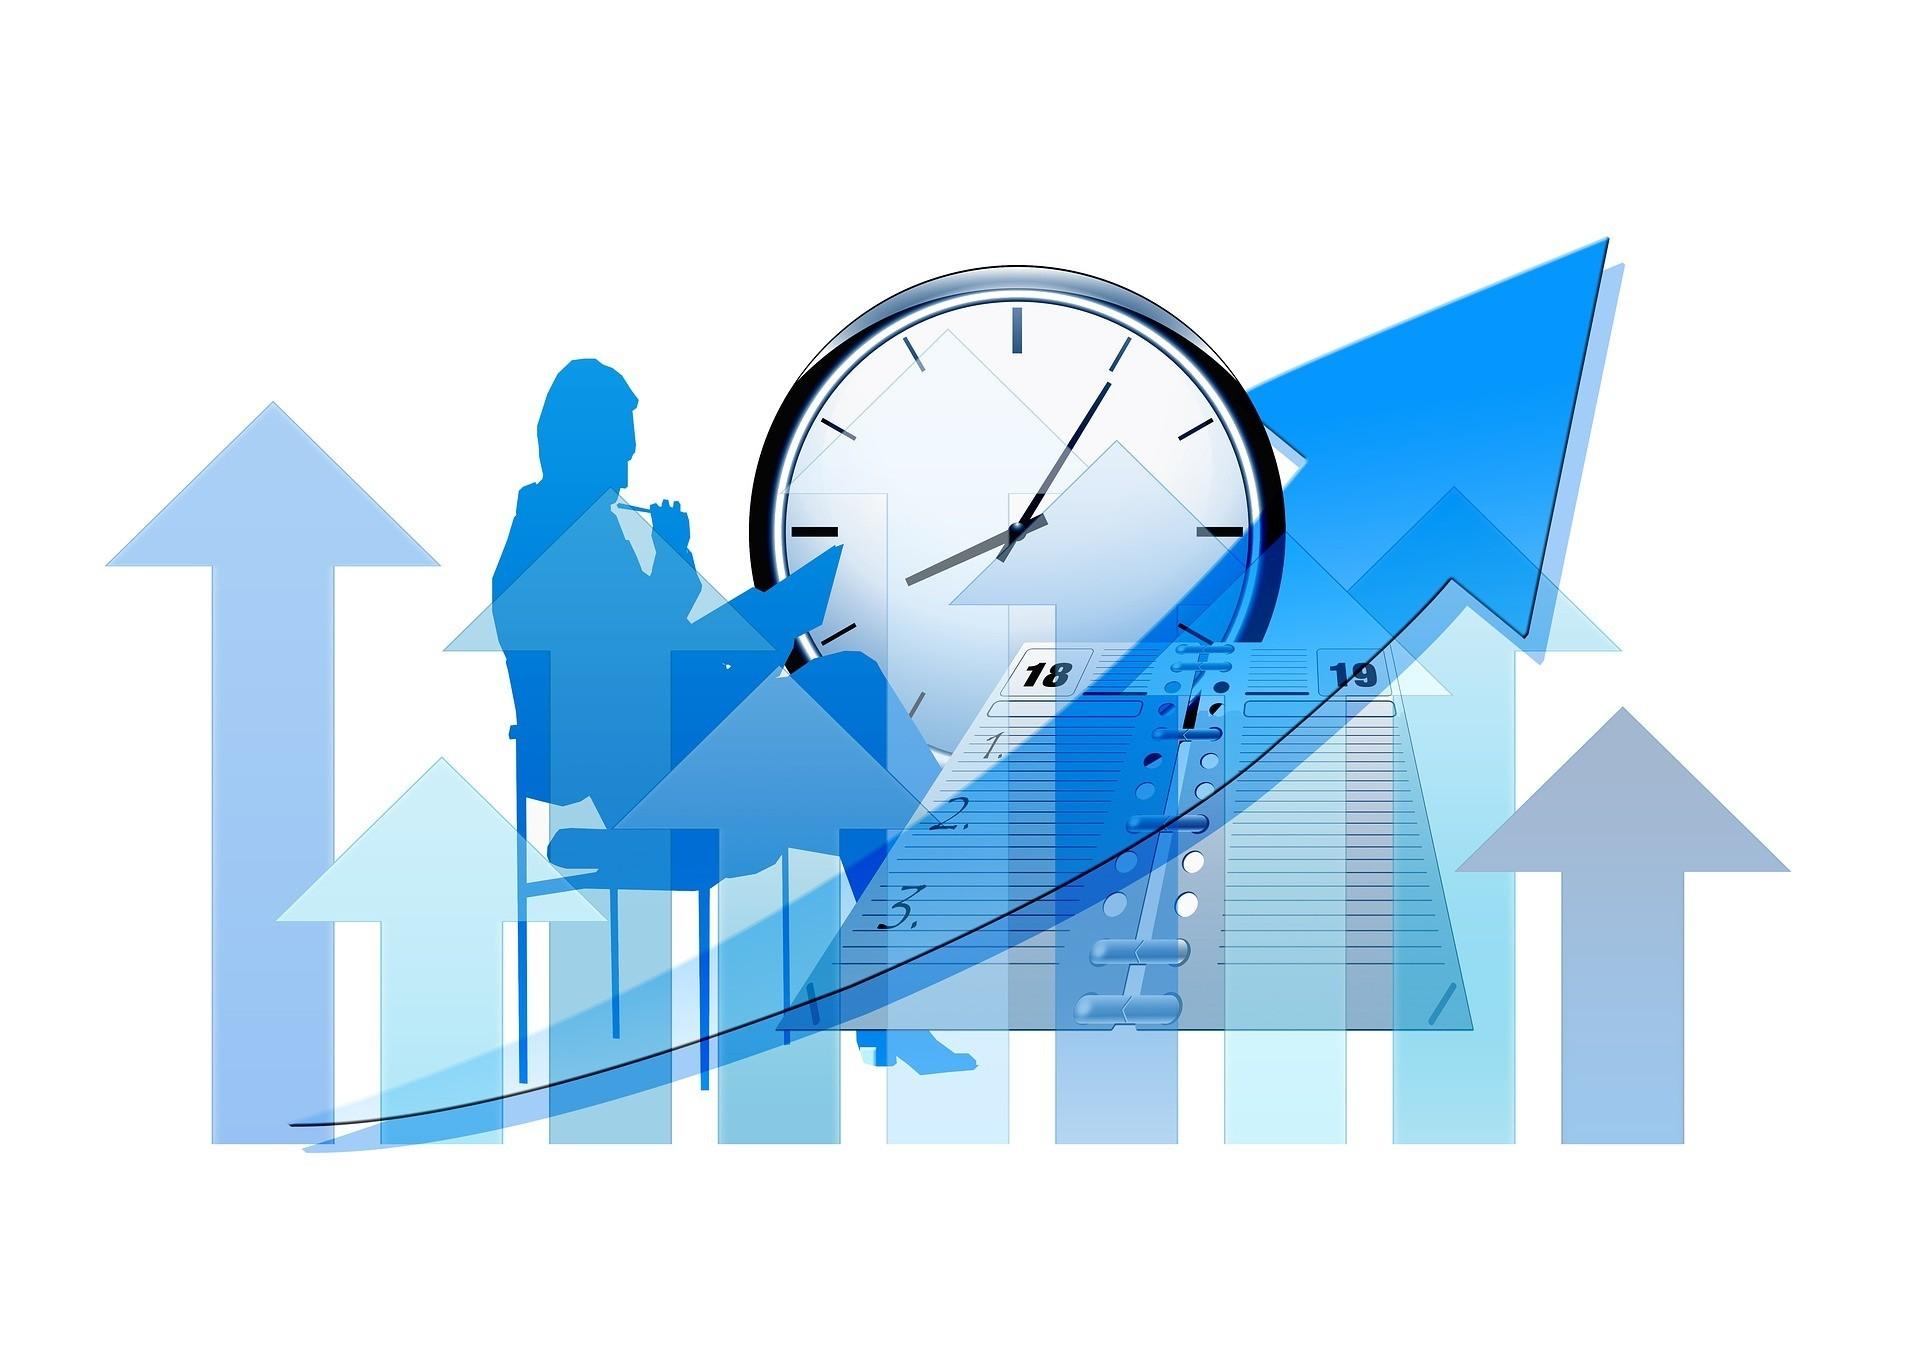 Maximizing Efficiency: The Value of Standardized Legal Billing Data